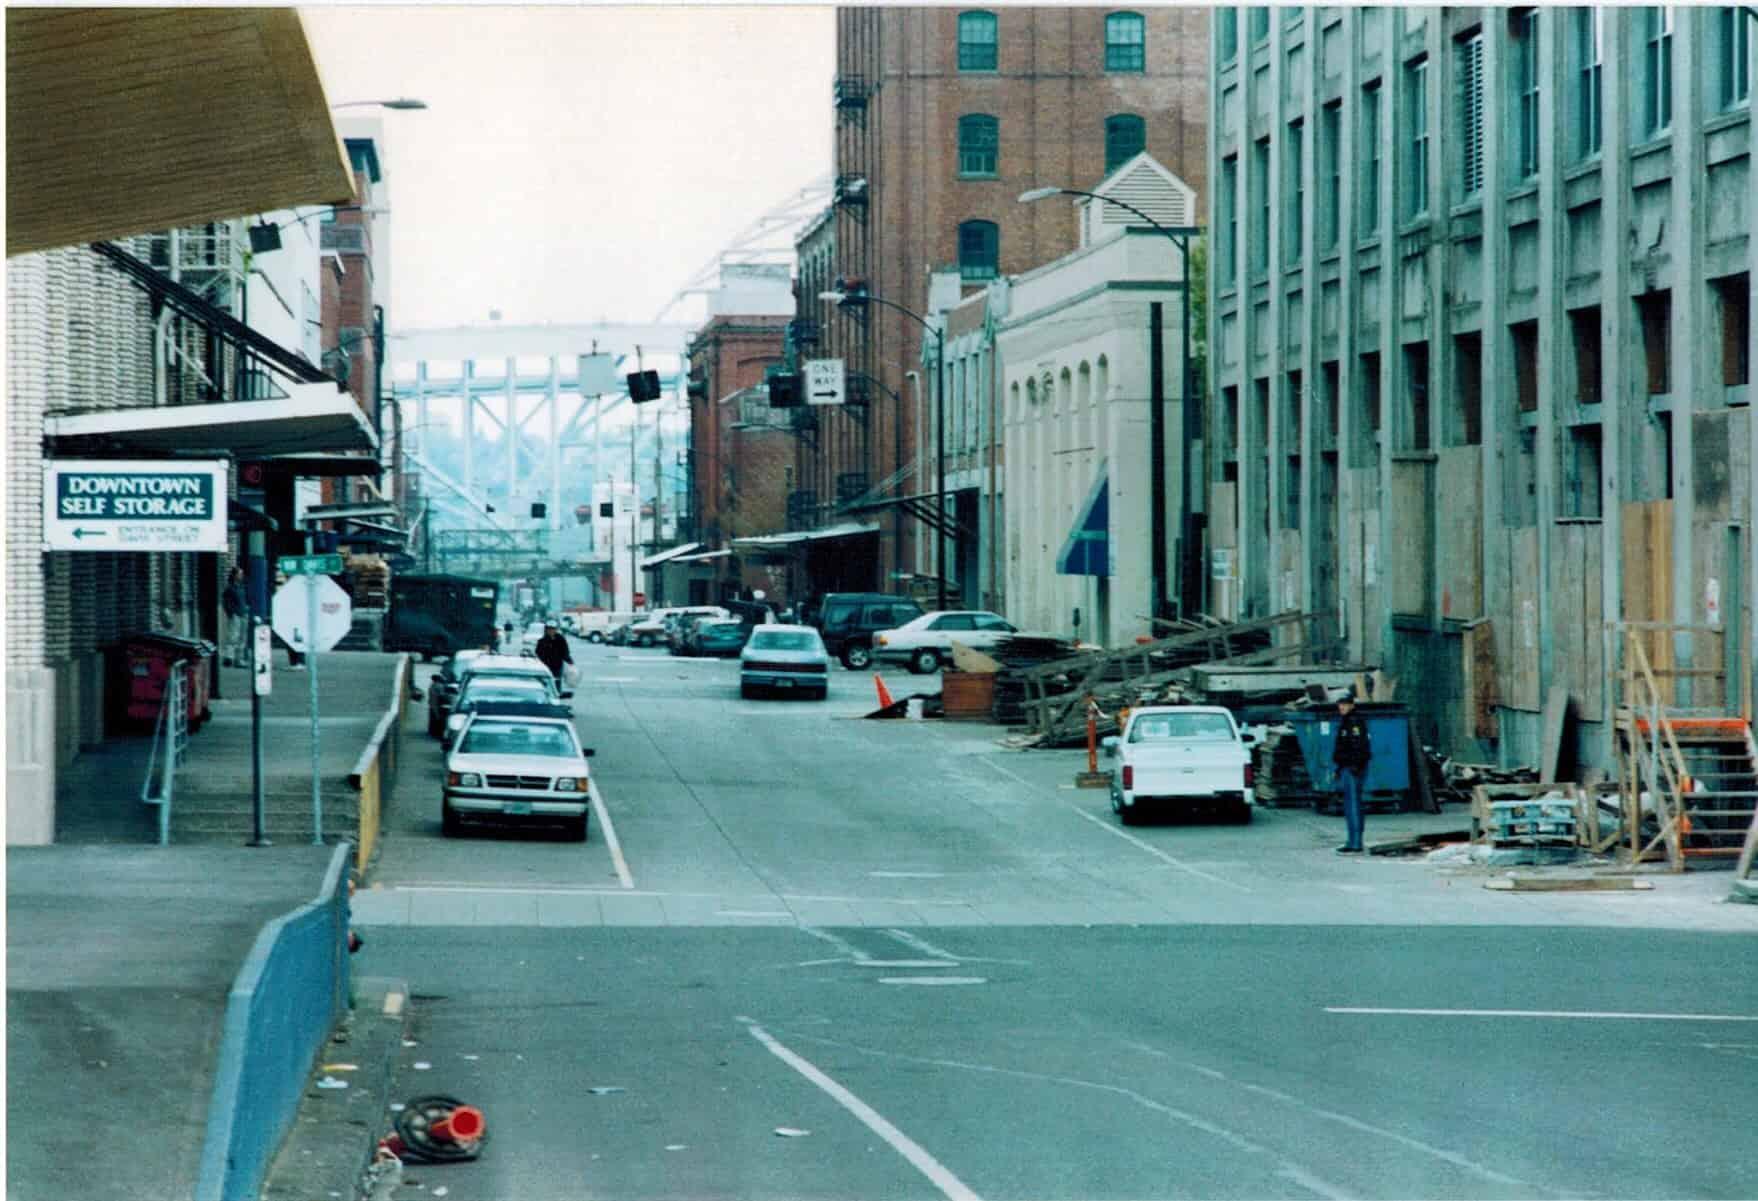 NW 13th and Davis ....from 1999! #wiedenkennedy #portlandarchitecture #positivelyportland #portlandoregon #freemontbridge #nwportland #pearldistrict #oregonarchitecture #1999